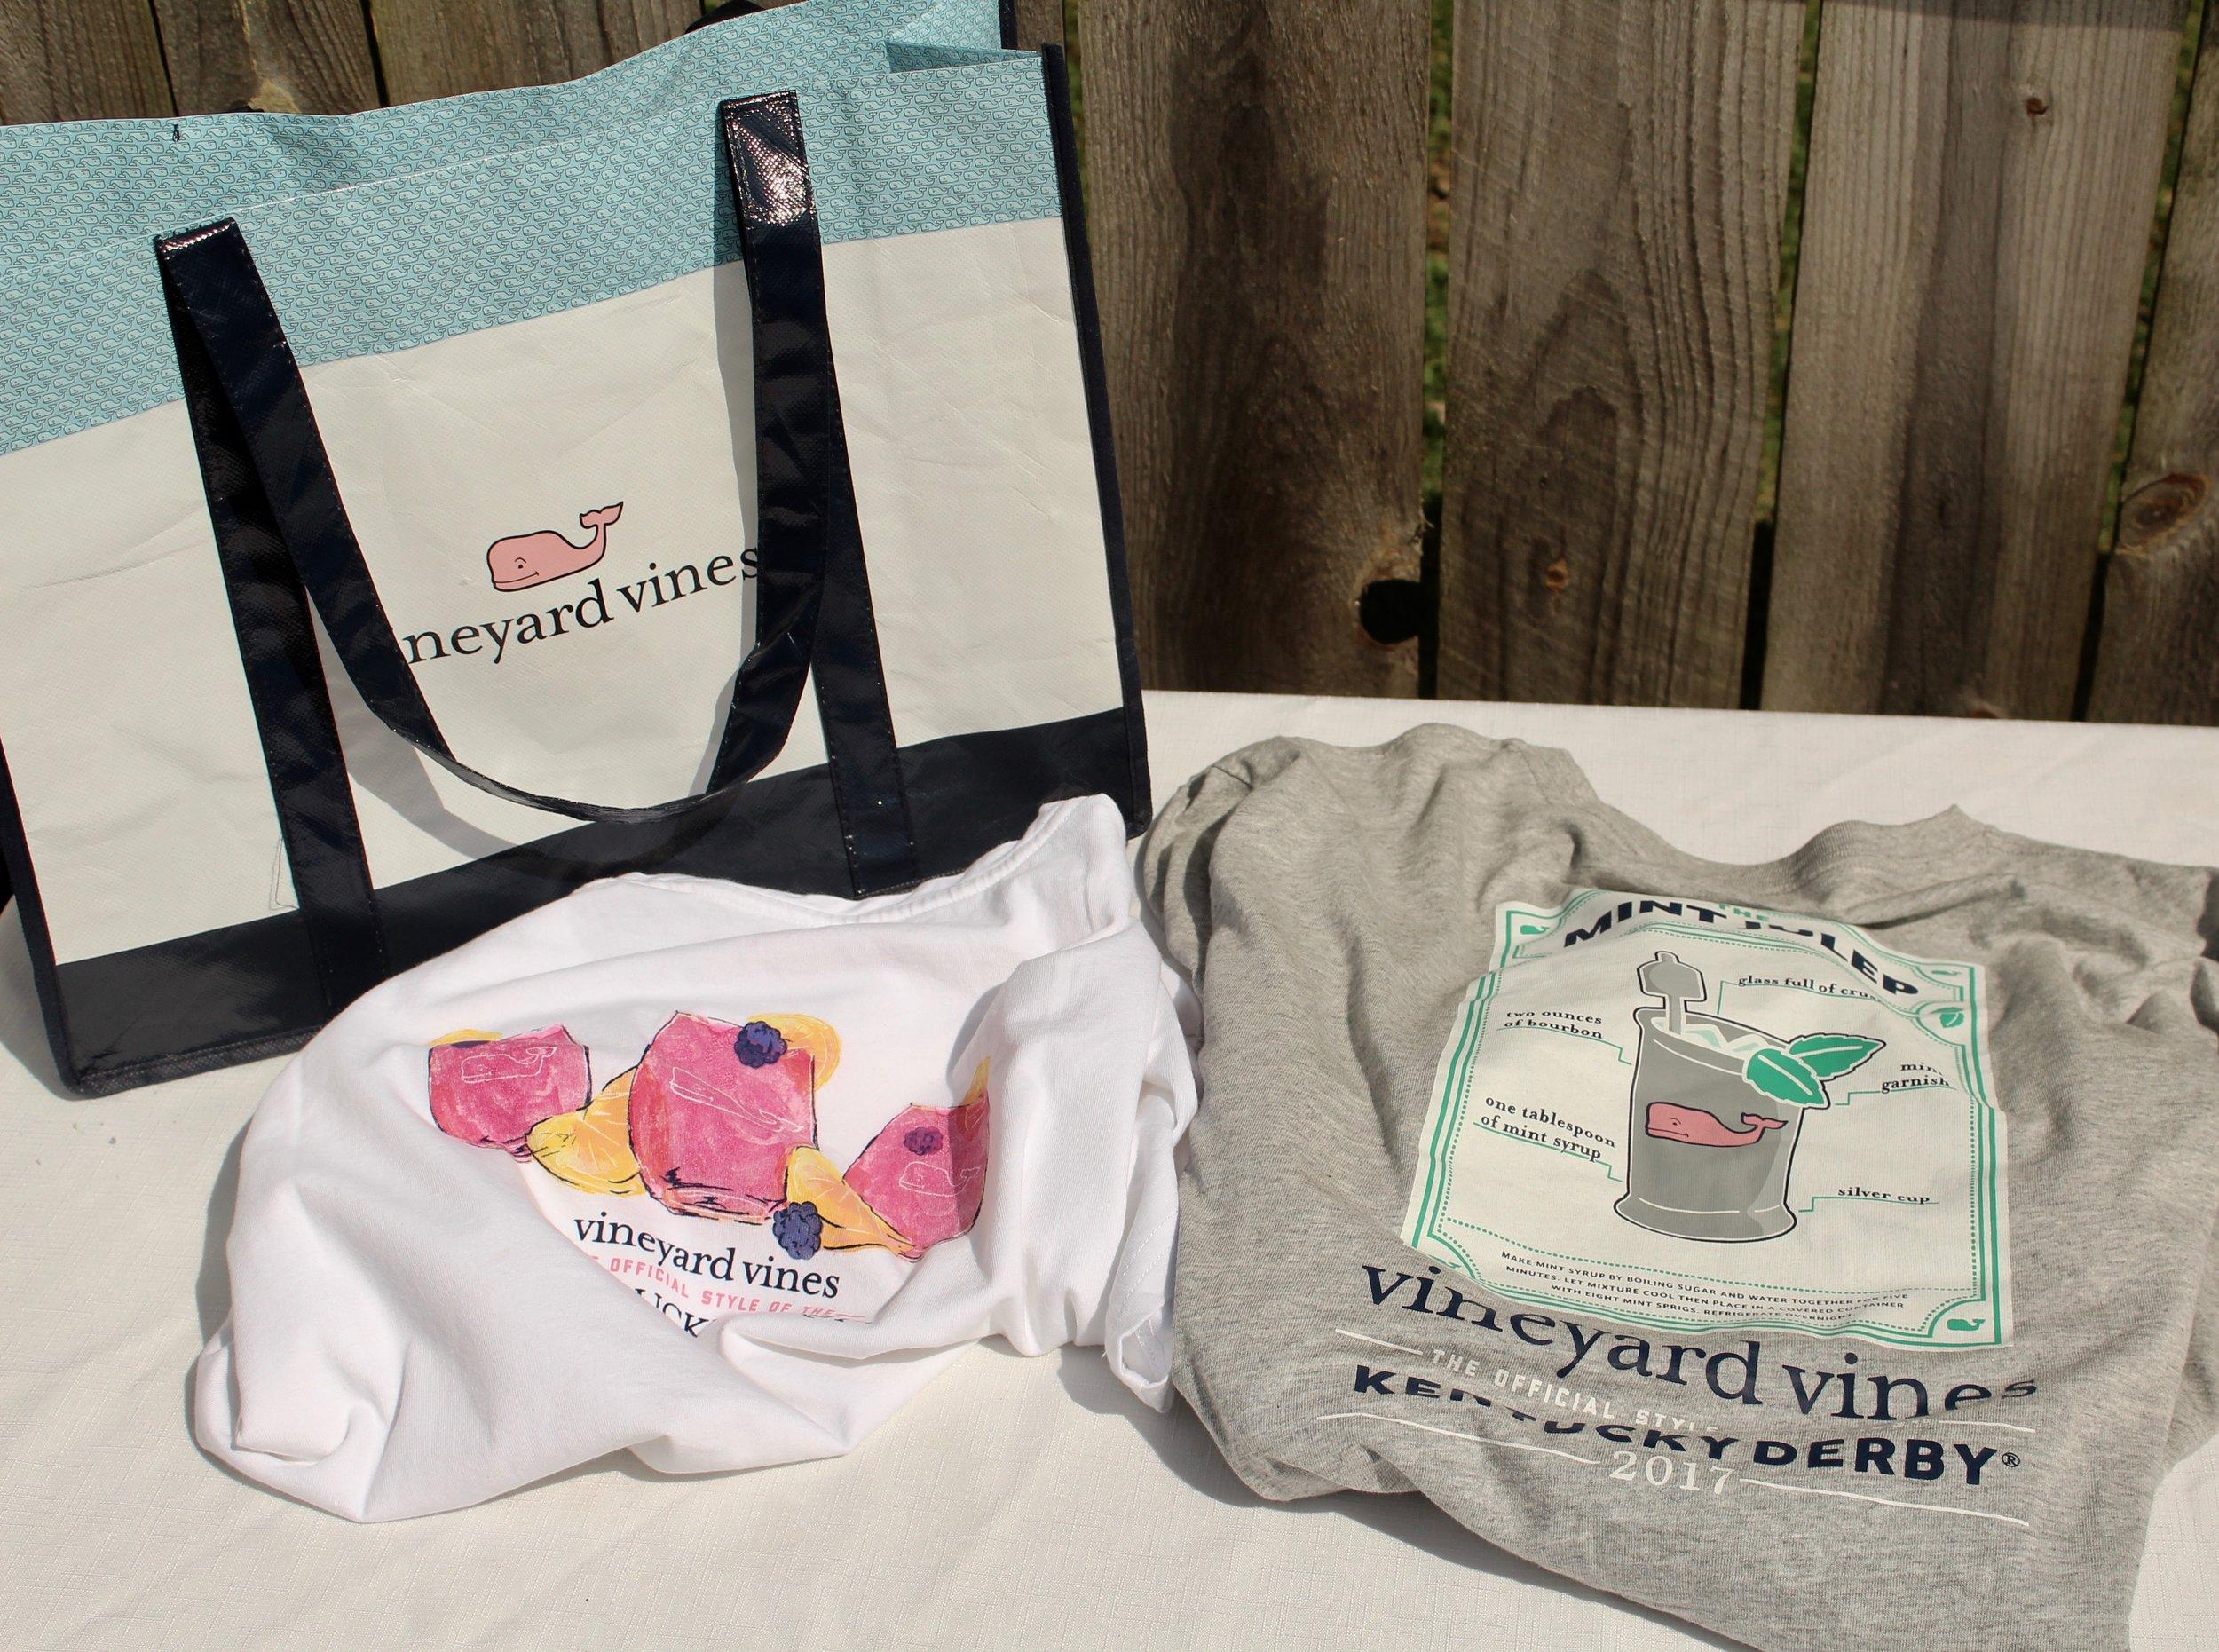 Vineyard Vines Kentucky Derby 143 Shirts